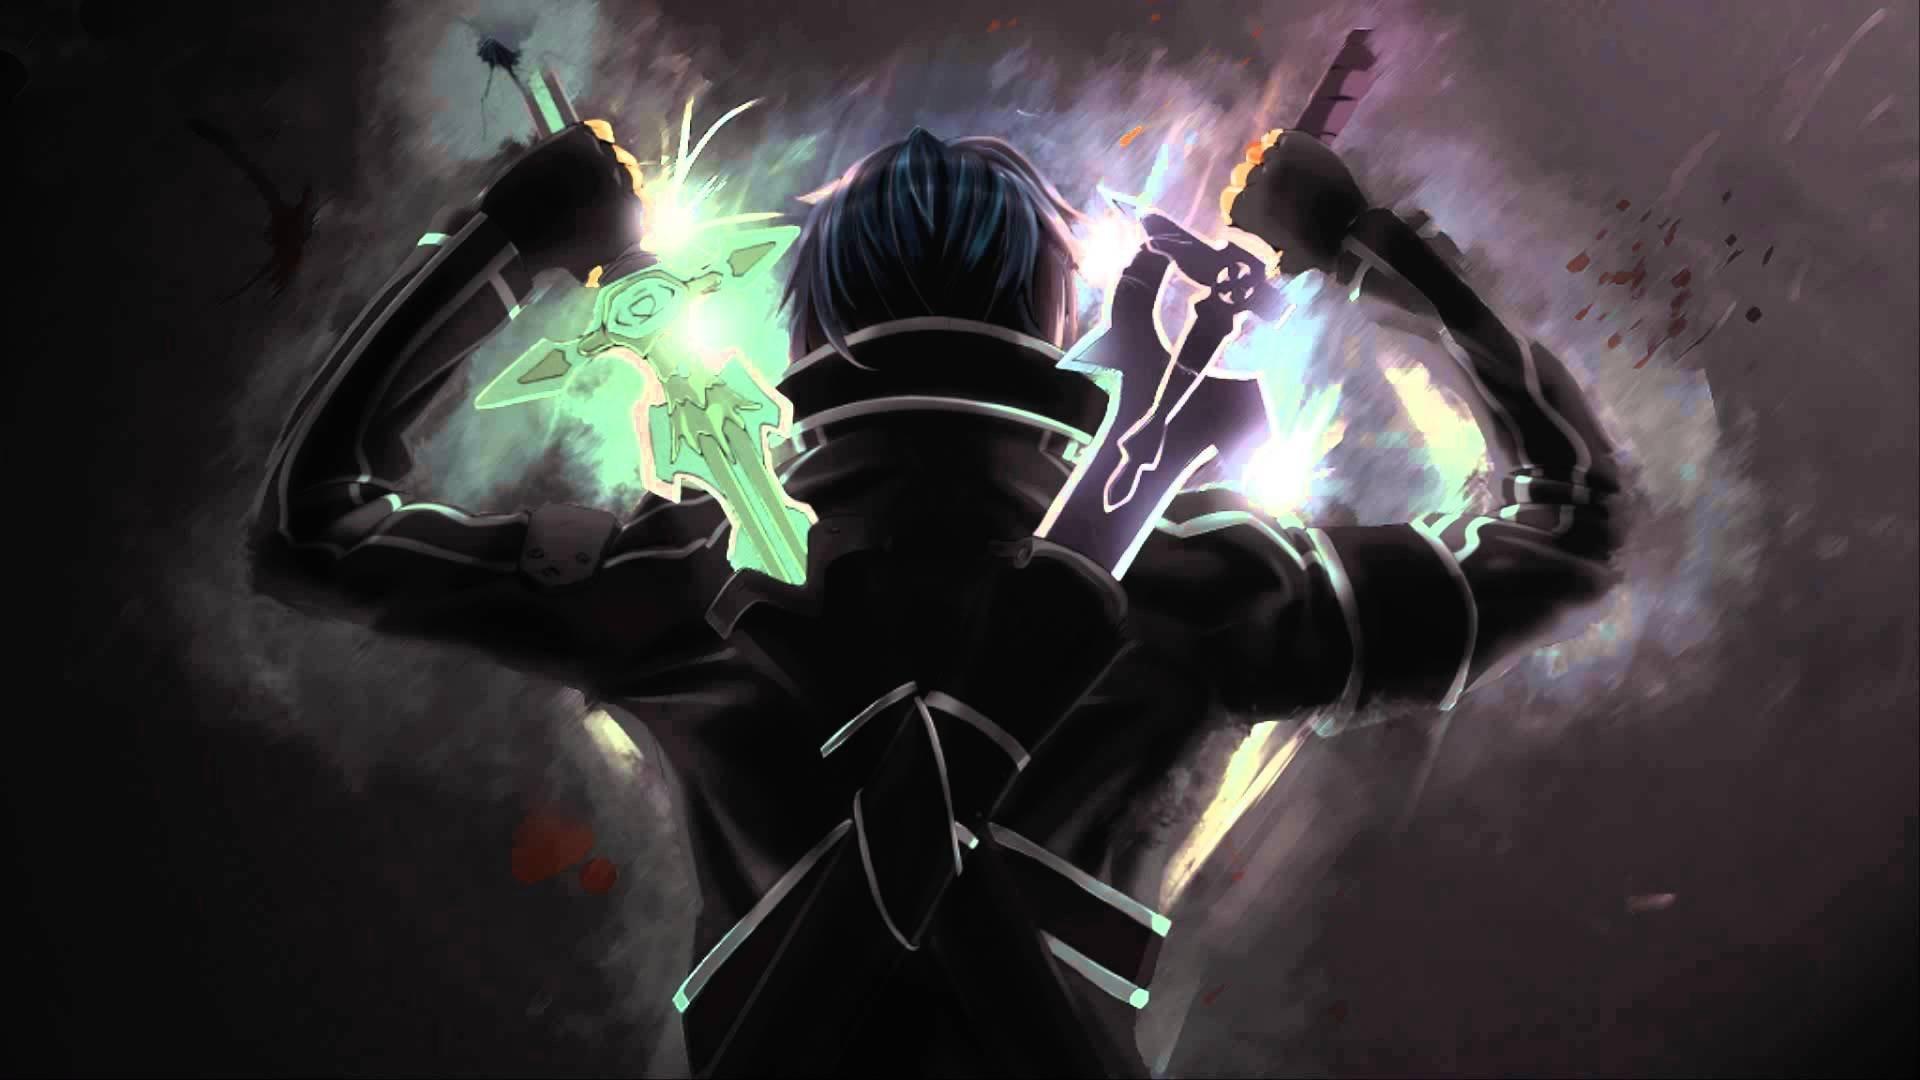 SWORD ART ONLINE II animation fighting sci-fi japanese anime 1saoll fantasy  warrior wallpaper     626102   WallpaperUP